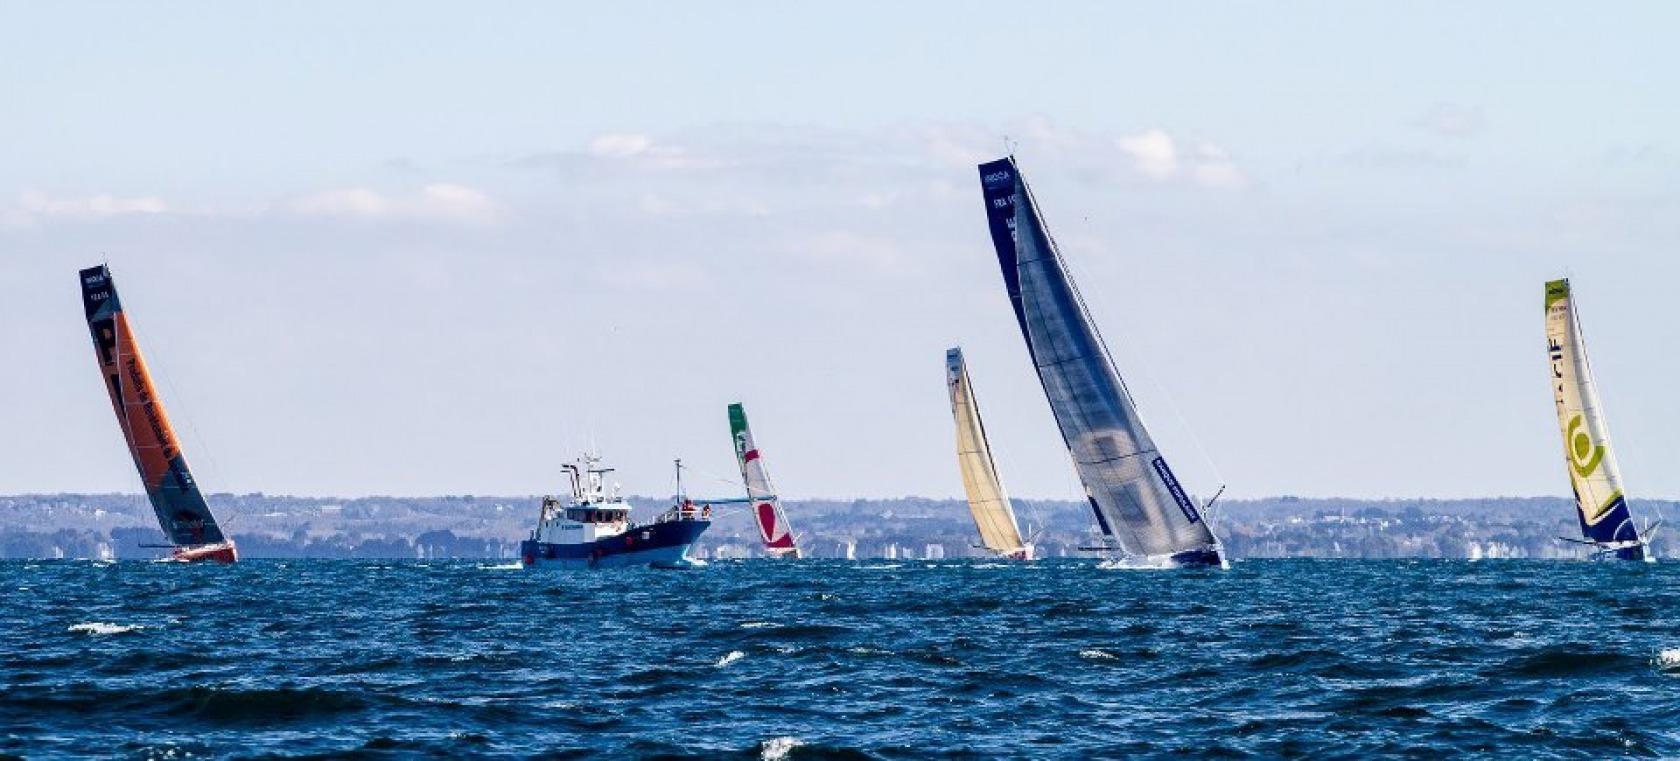 pole-finistere-course-au-large-r-1680-1200